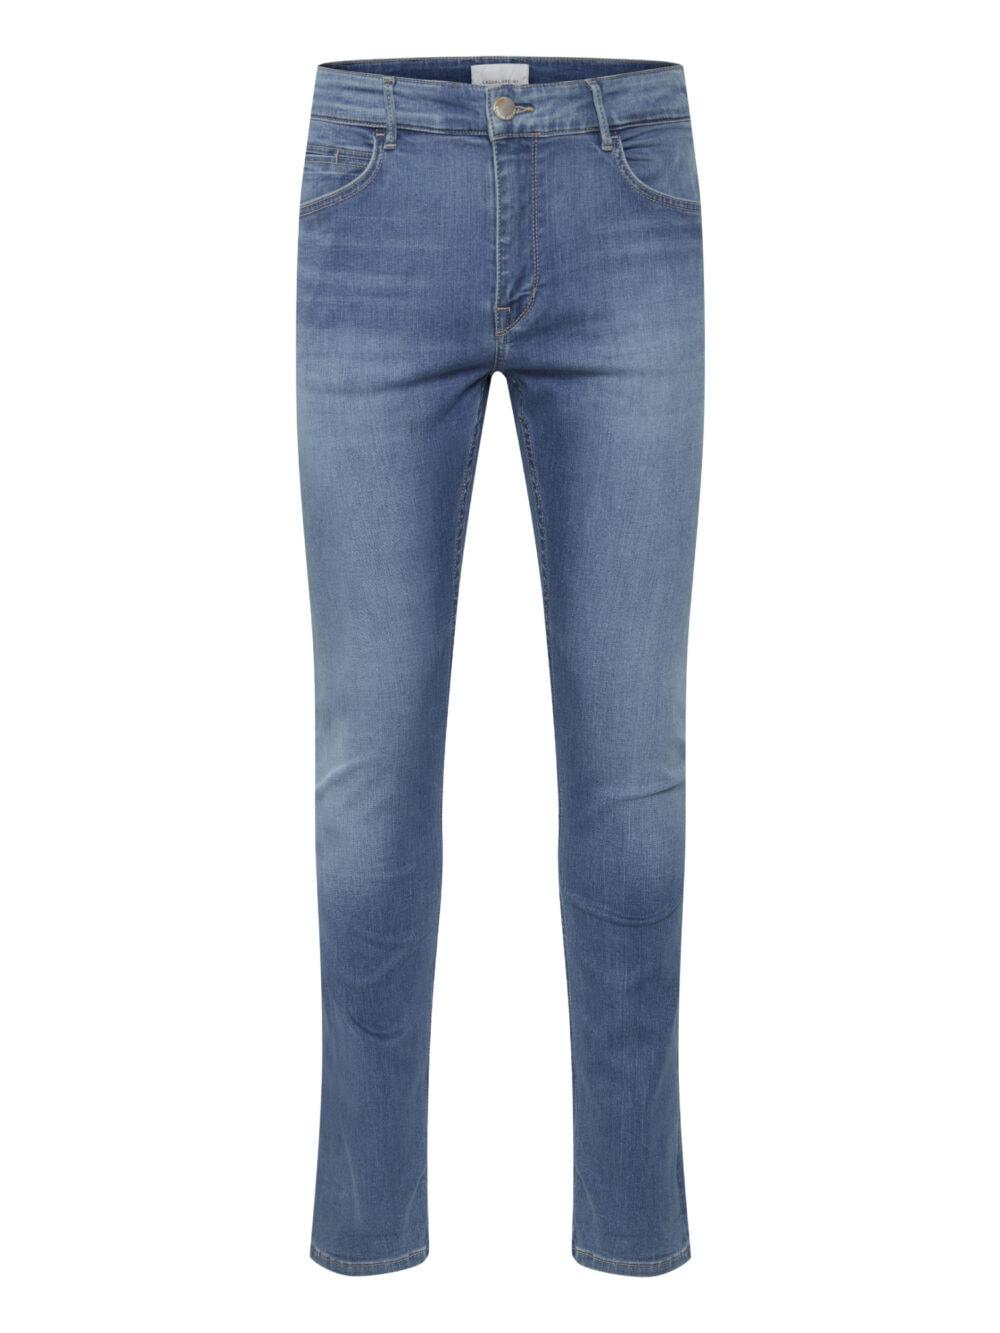 Casual Friday RY Flex Jeans Light Blue